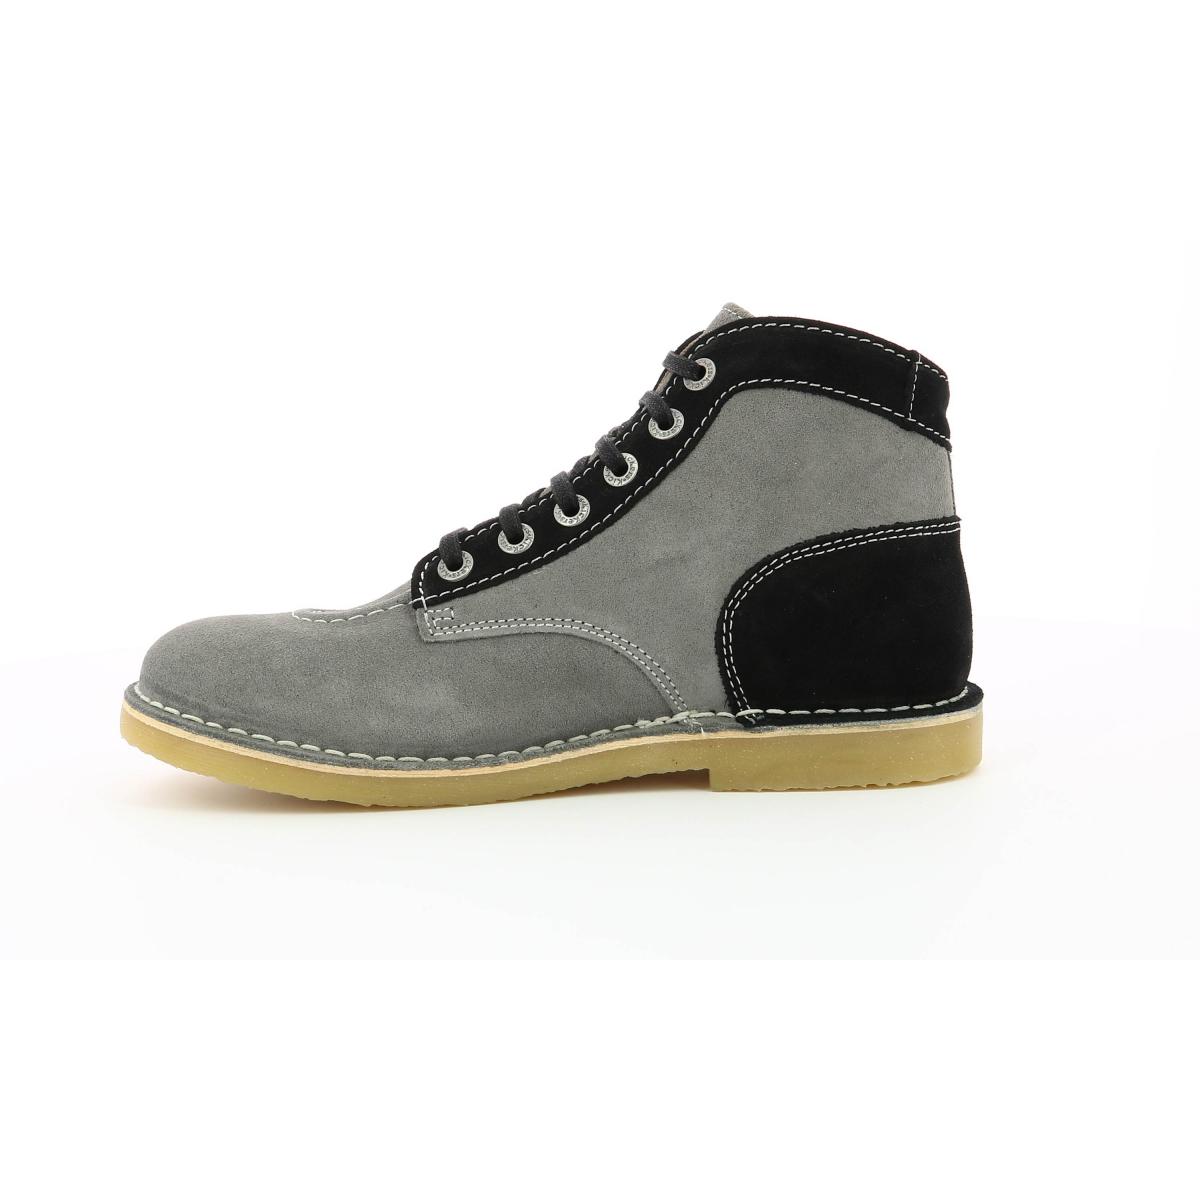 0f880da6a84d18 Orilegend Chaussures Gris Noir Homme Kickers ARL5qc34j